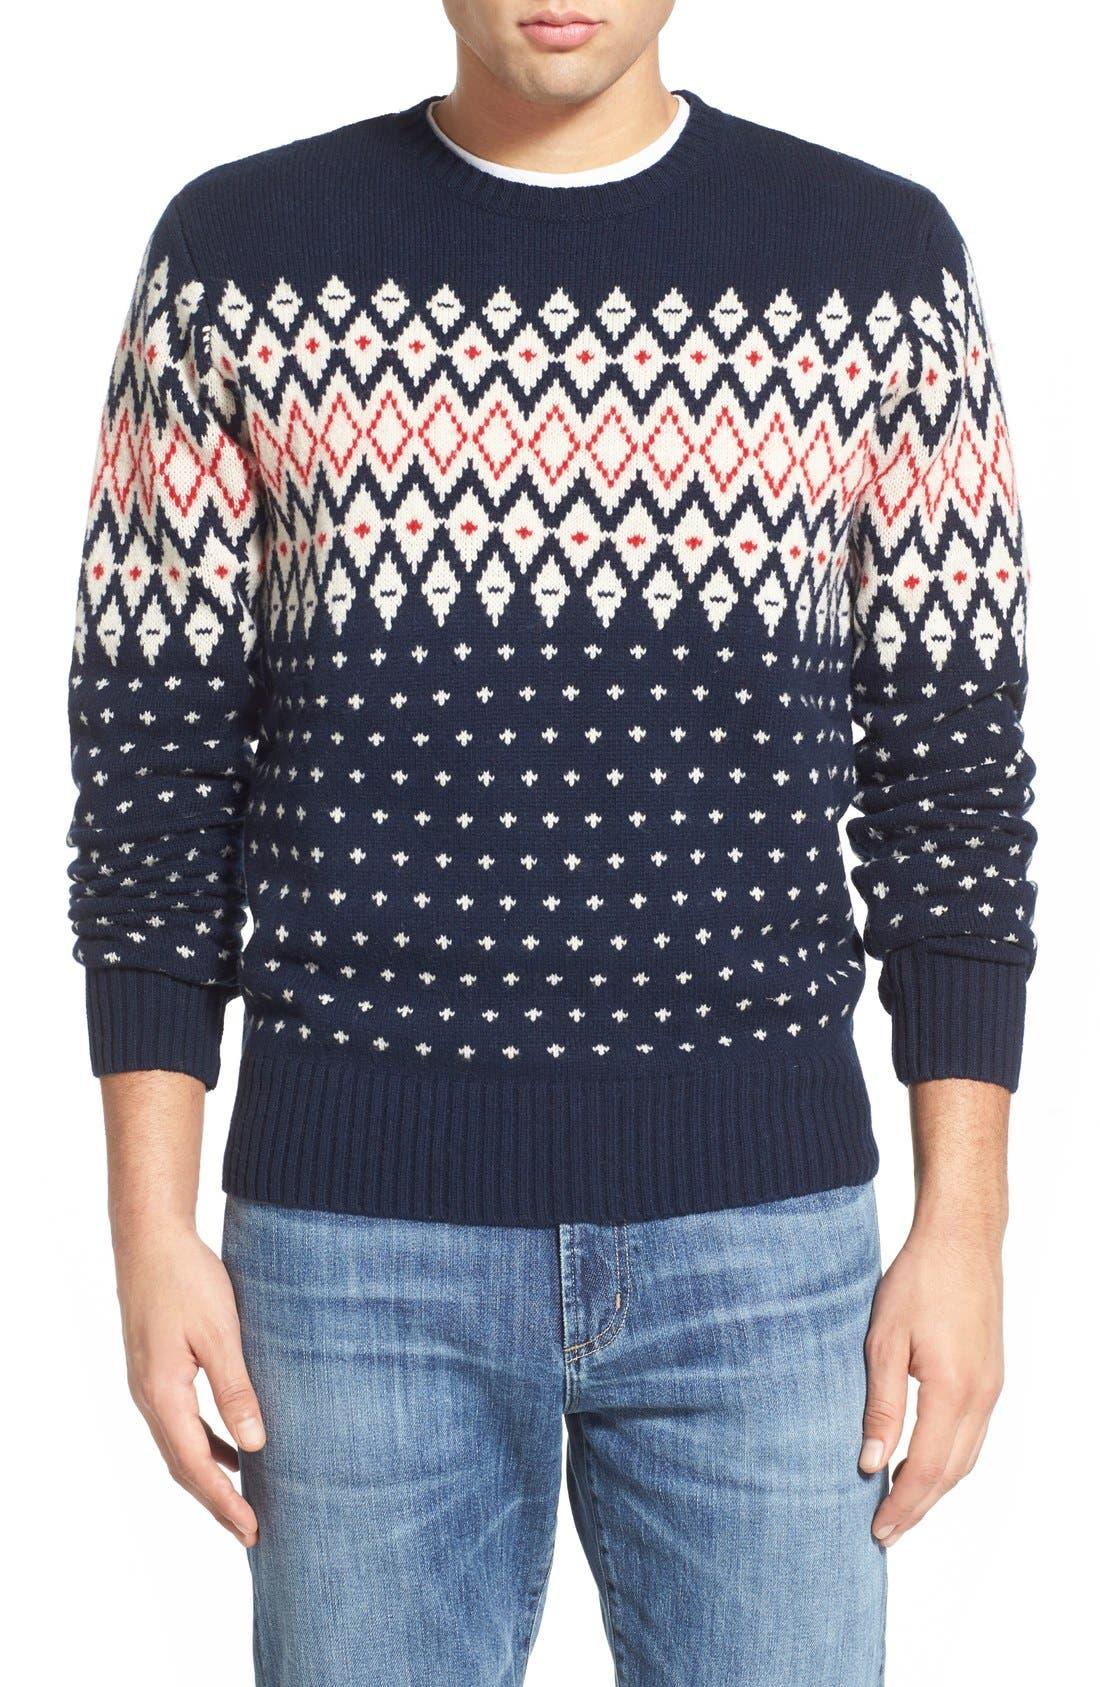 Gant Lambswool Fair Isle Crewneck Sweater | Nordstrom